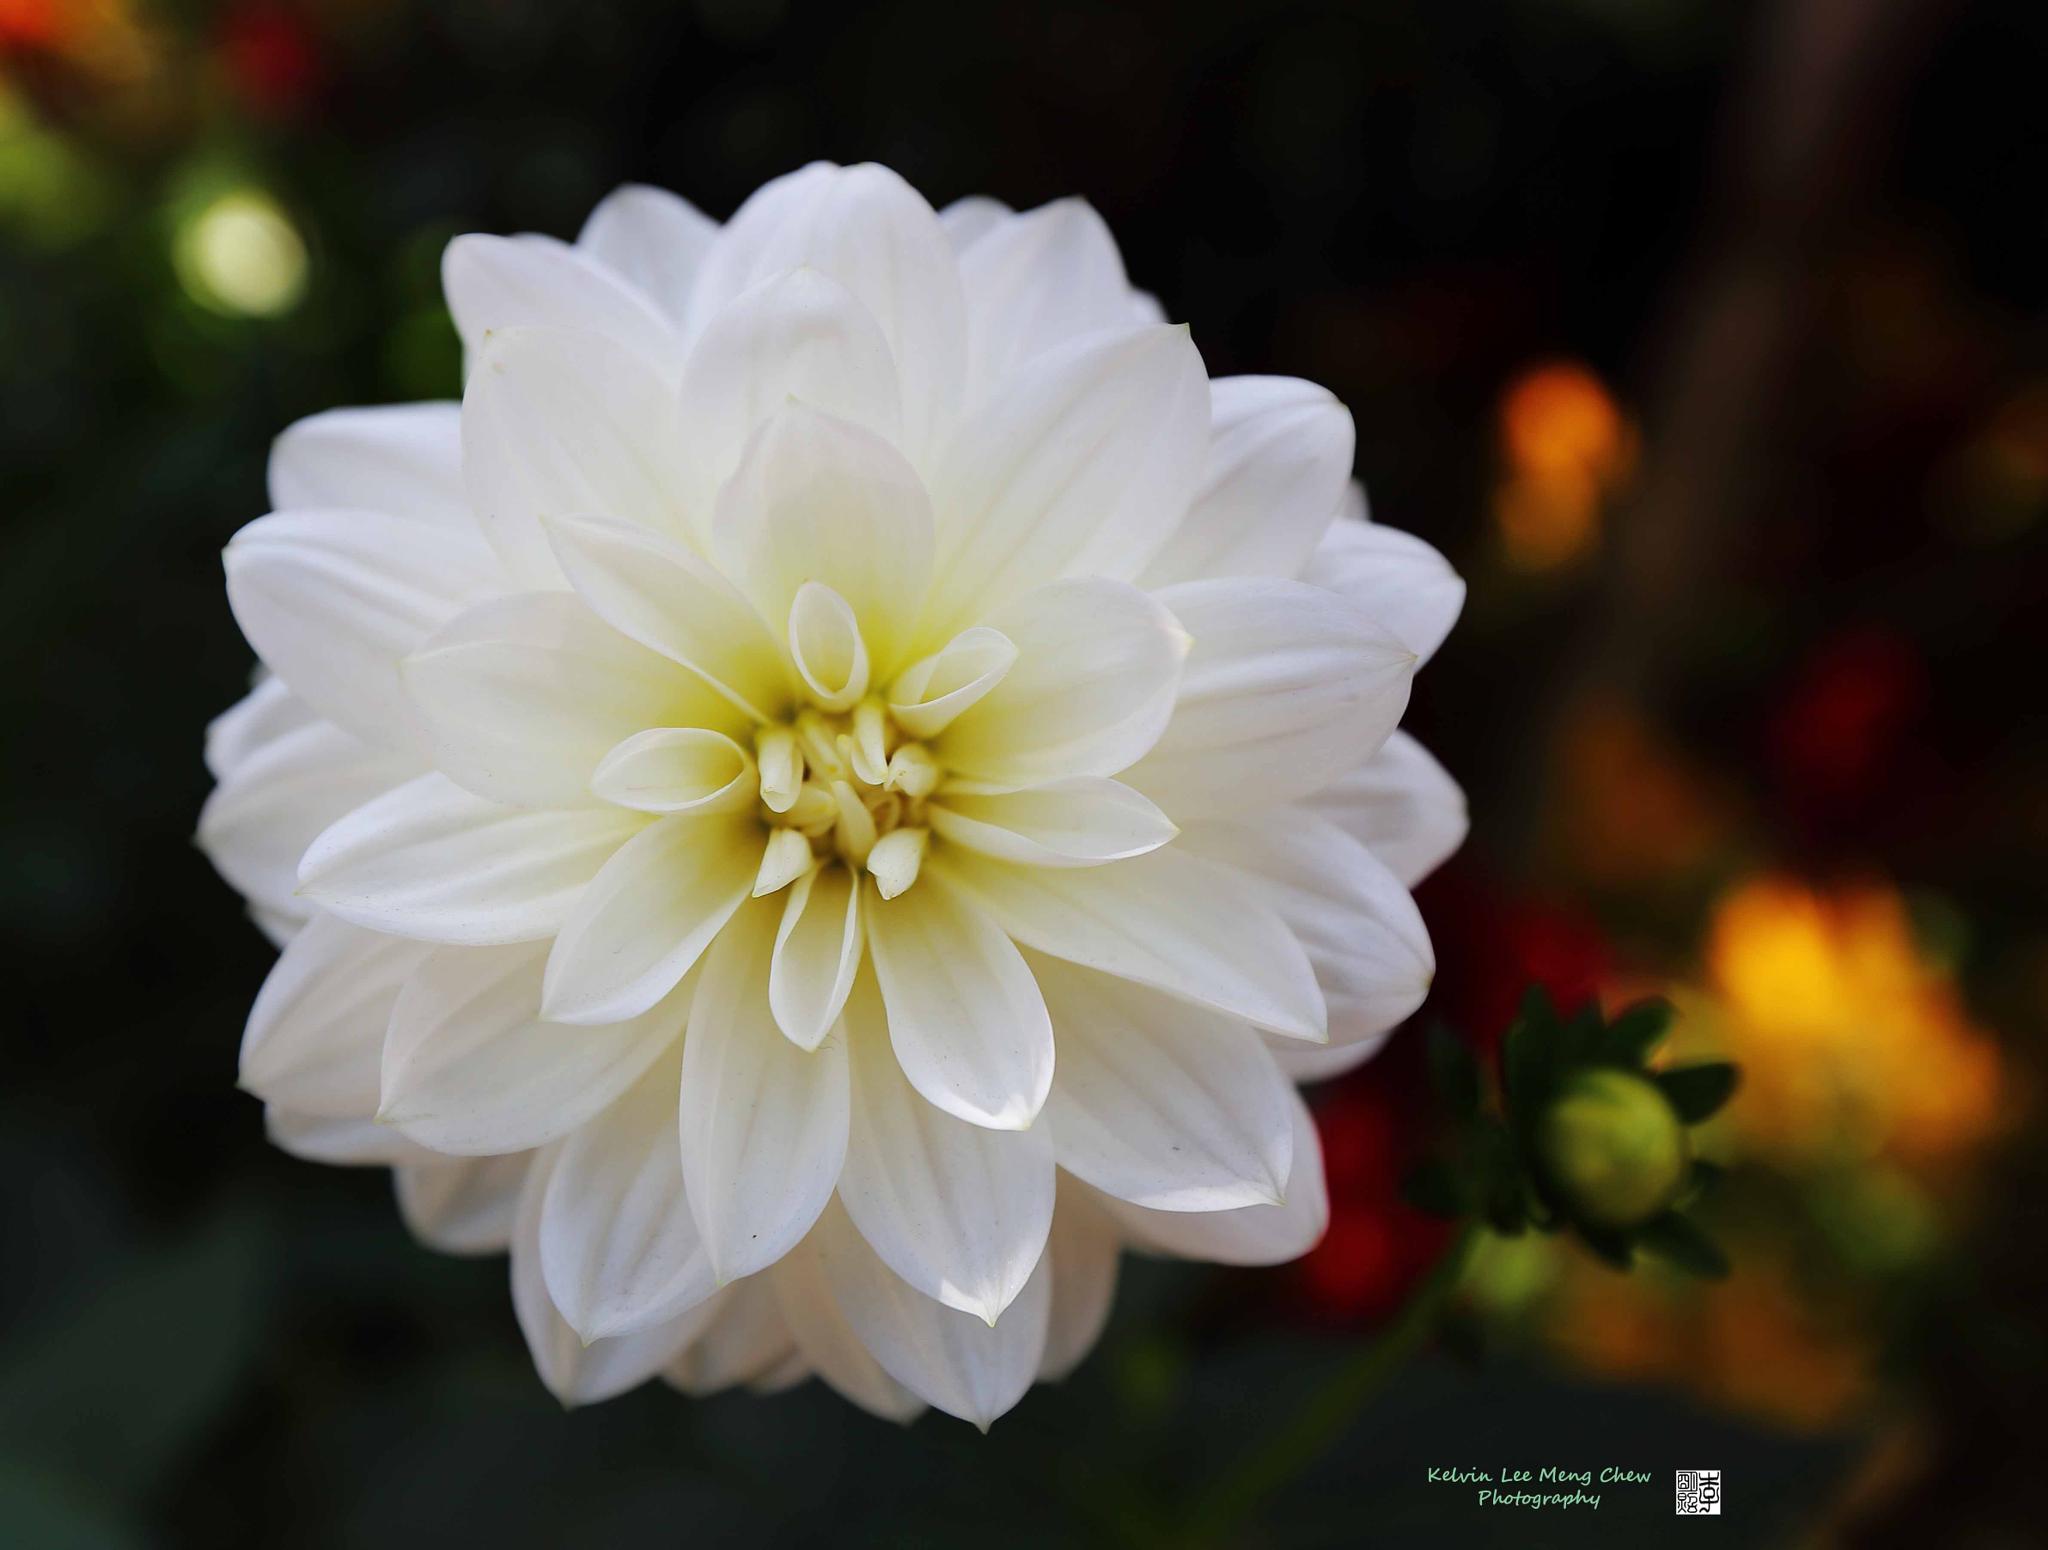 Flower by Kelvin Lee